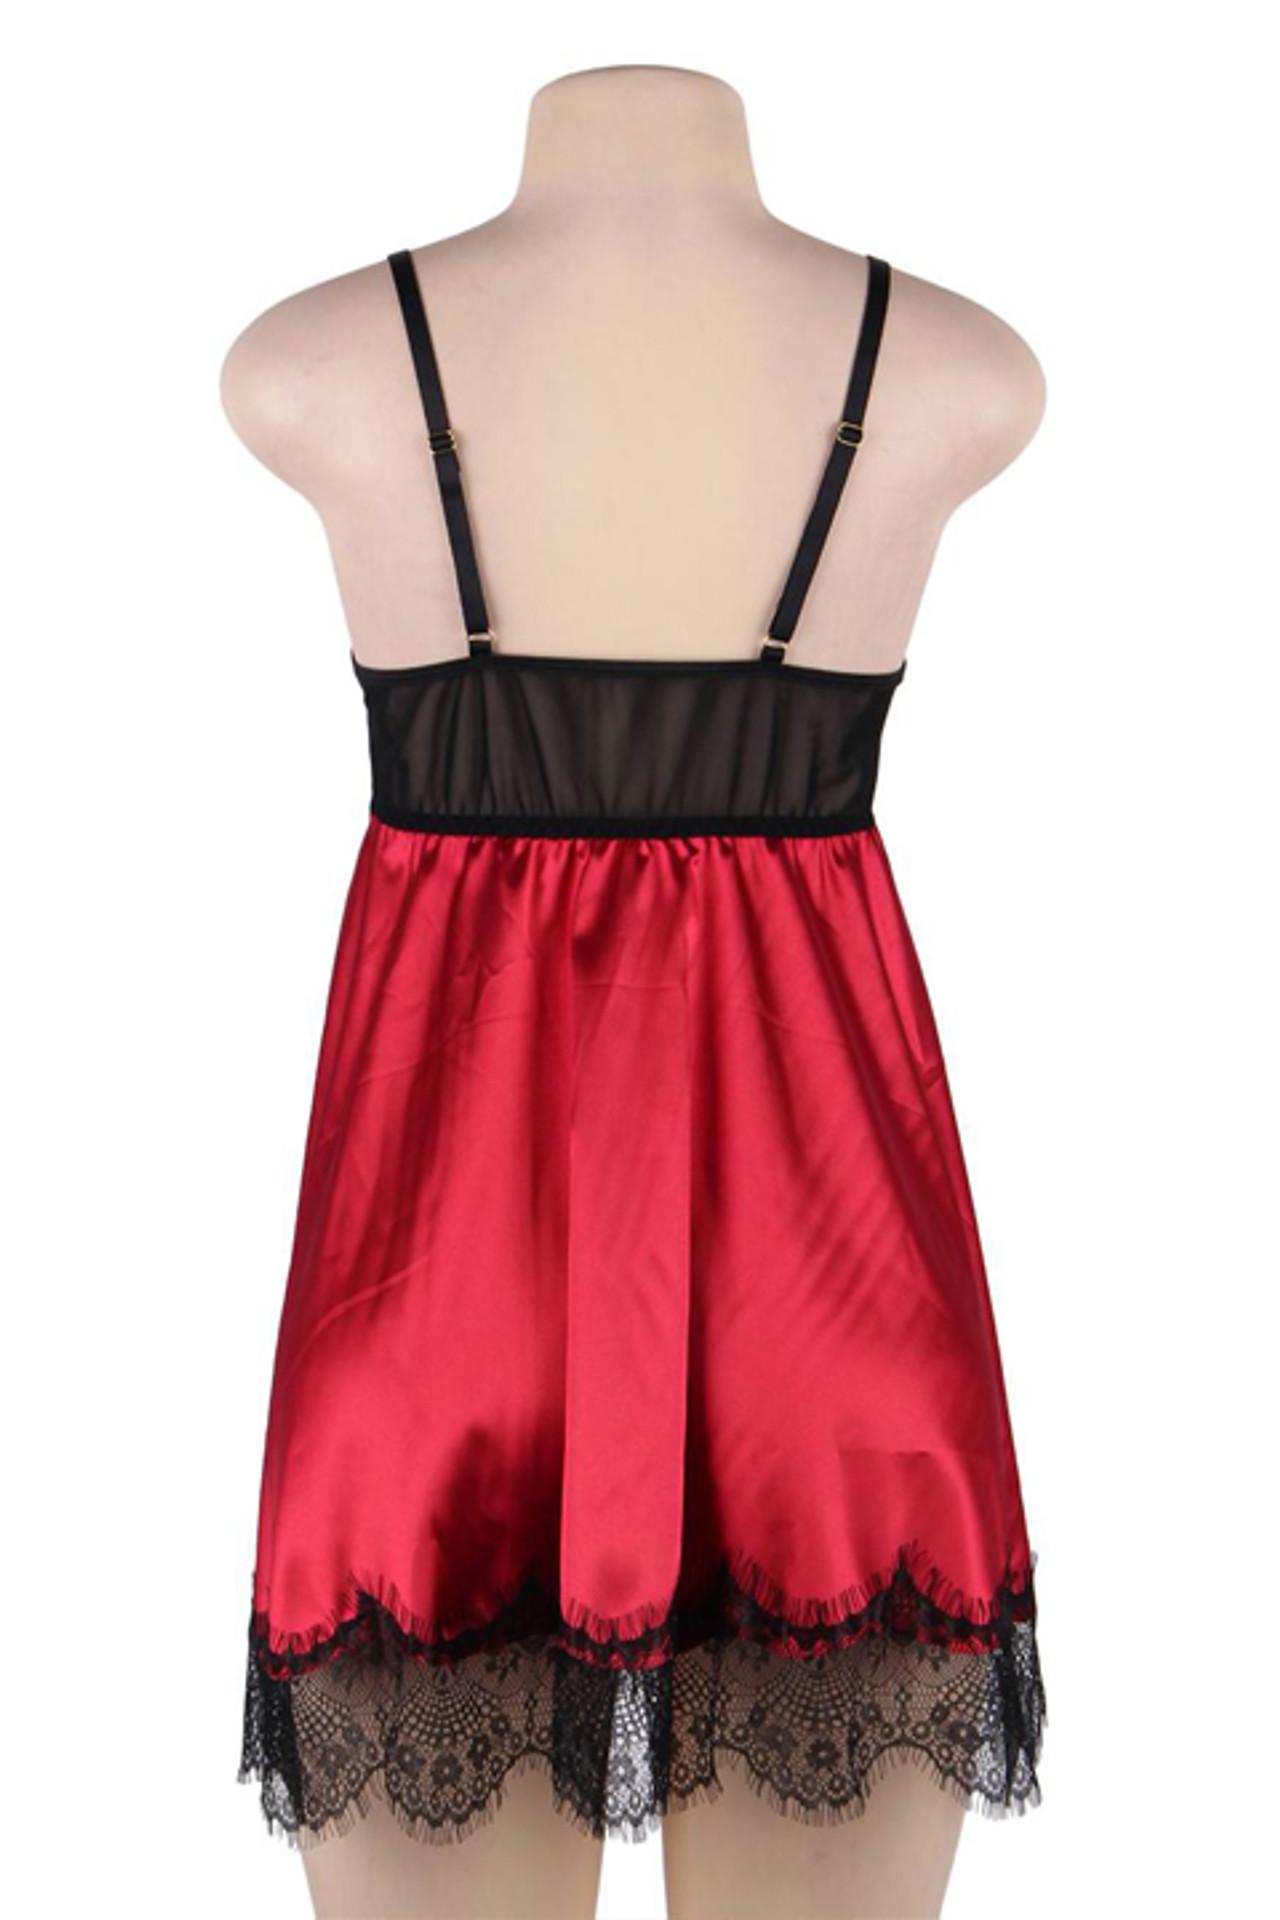 Scarlett Black Lace Red Satin Babydoll